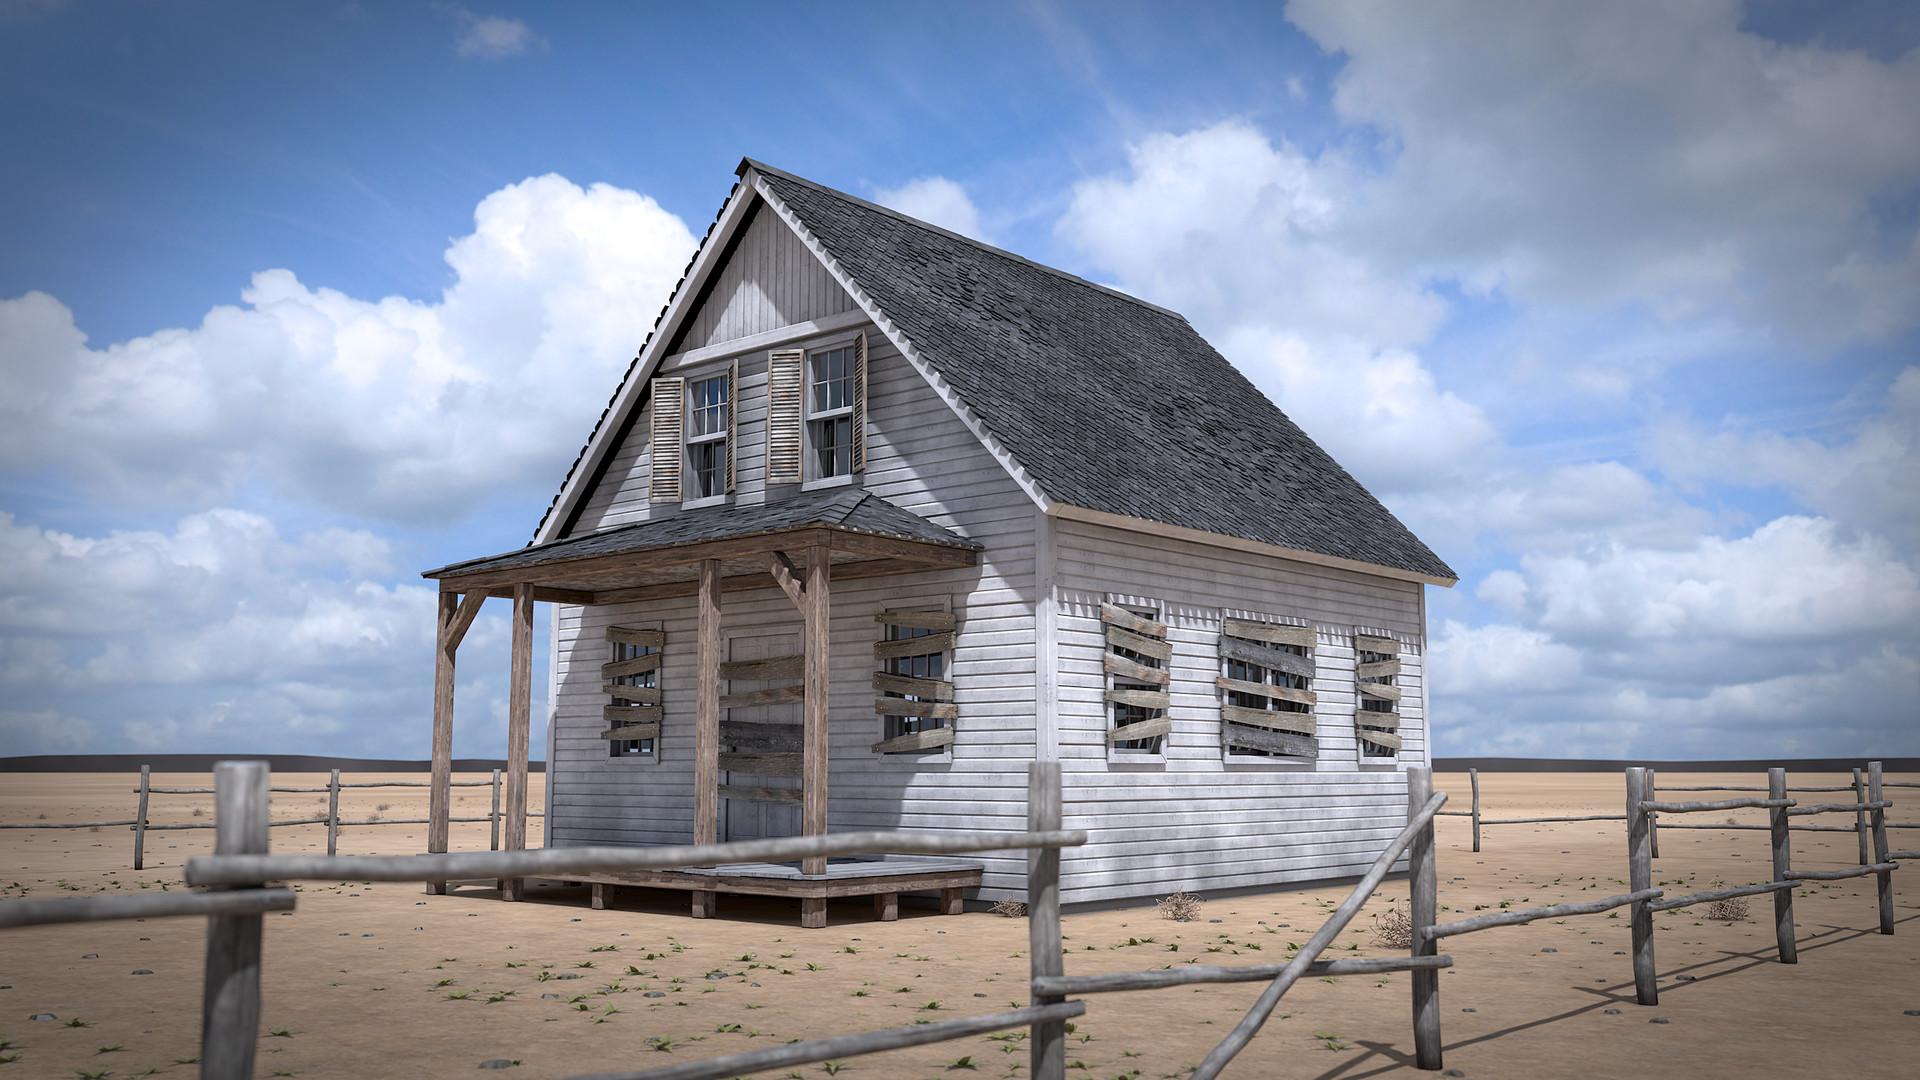 ArtStation - Abandoned House - Free Project (Cinema 4D